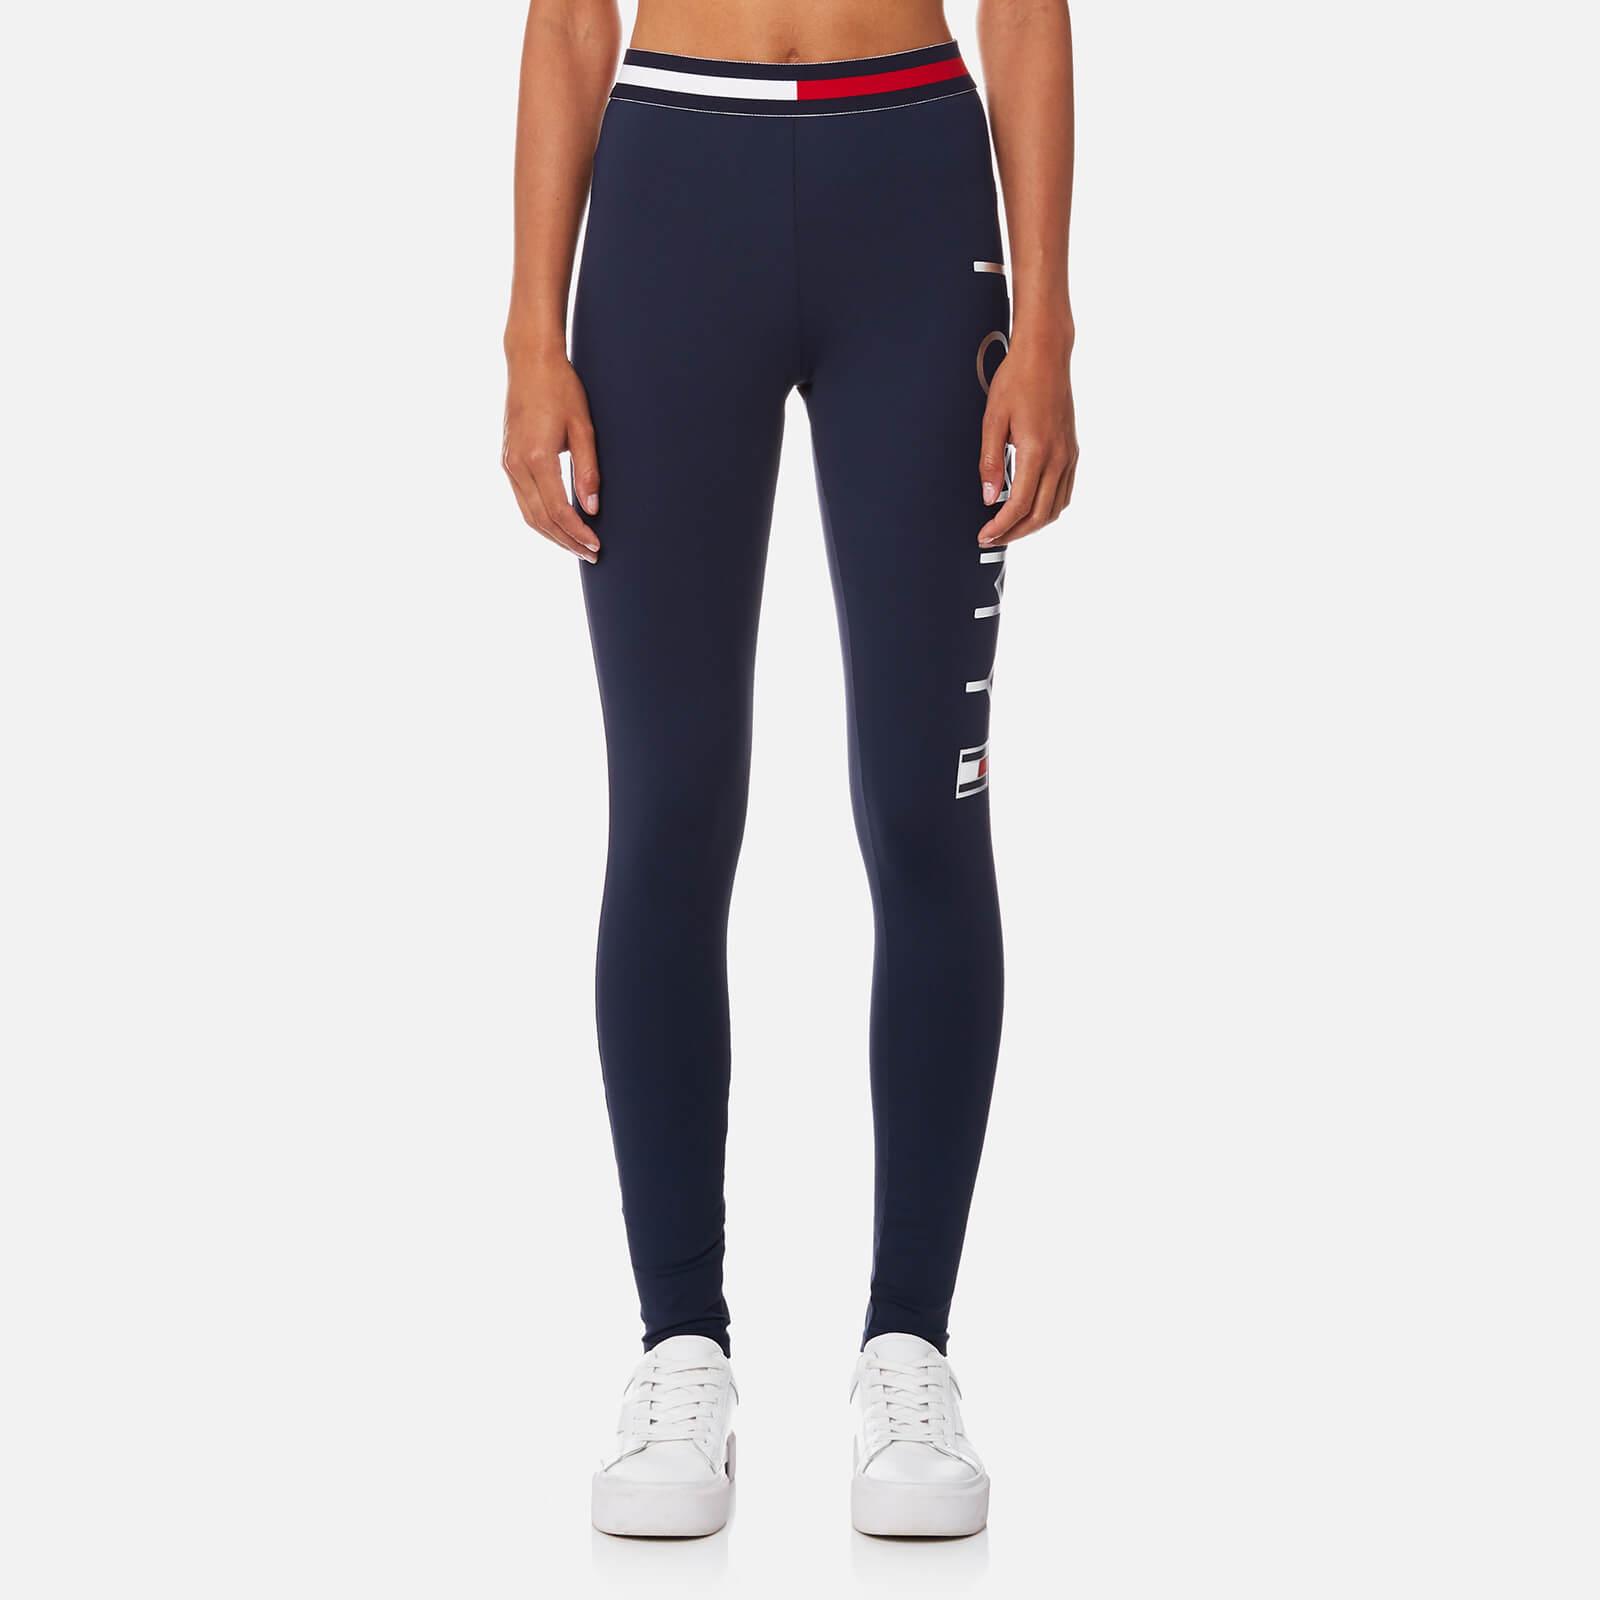 c8e2d5258 Tommy Hilfiger Women s Active Wear Tiffany Logo Leggings - Peacoat Womens  Clothing